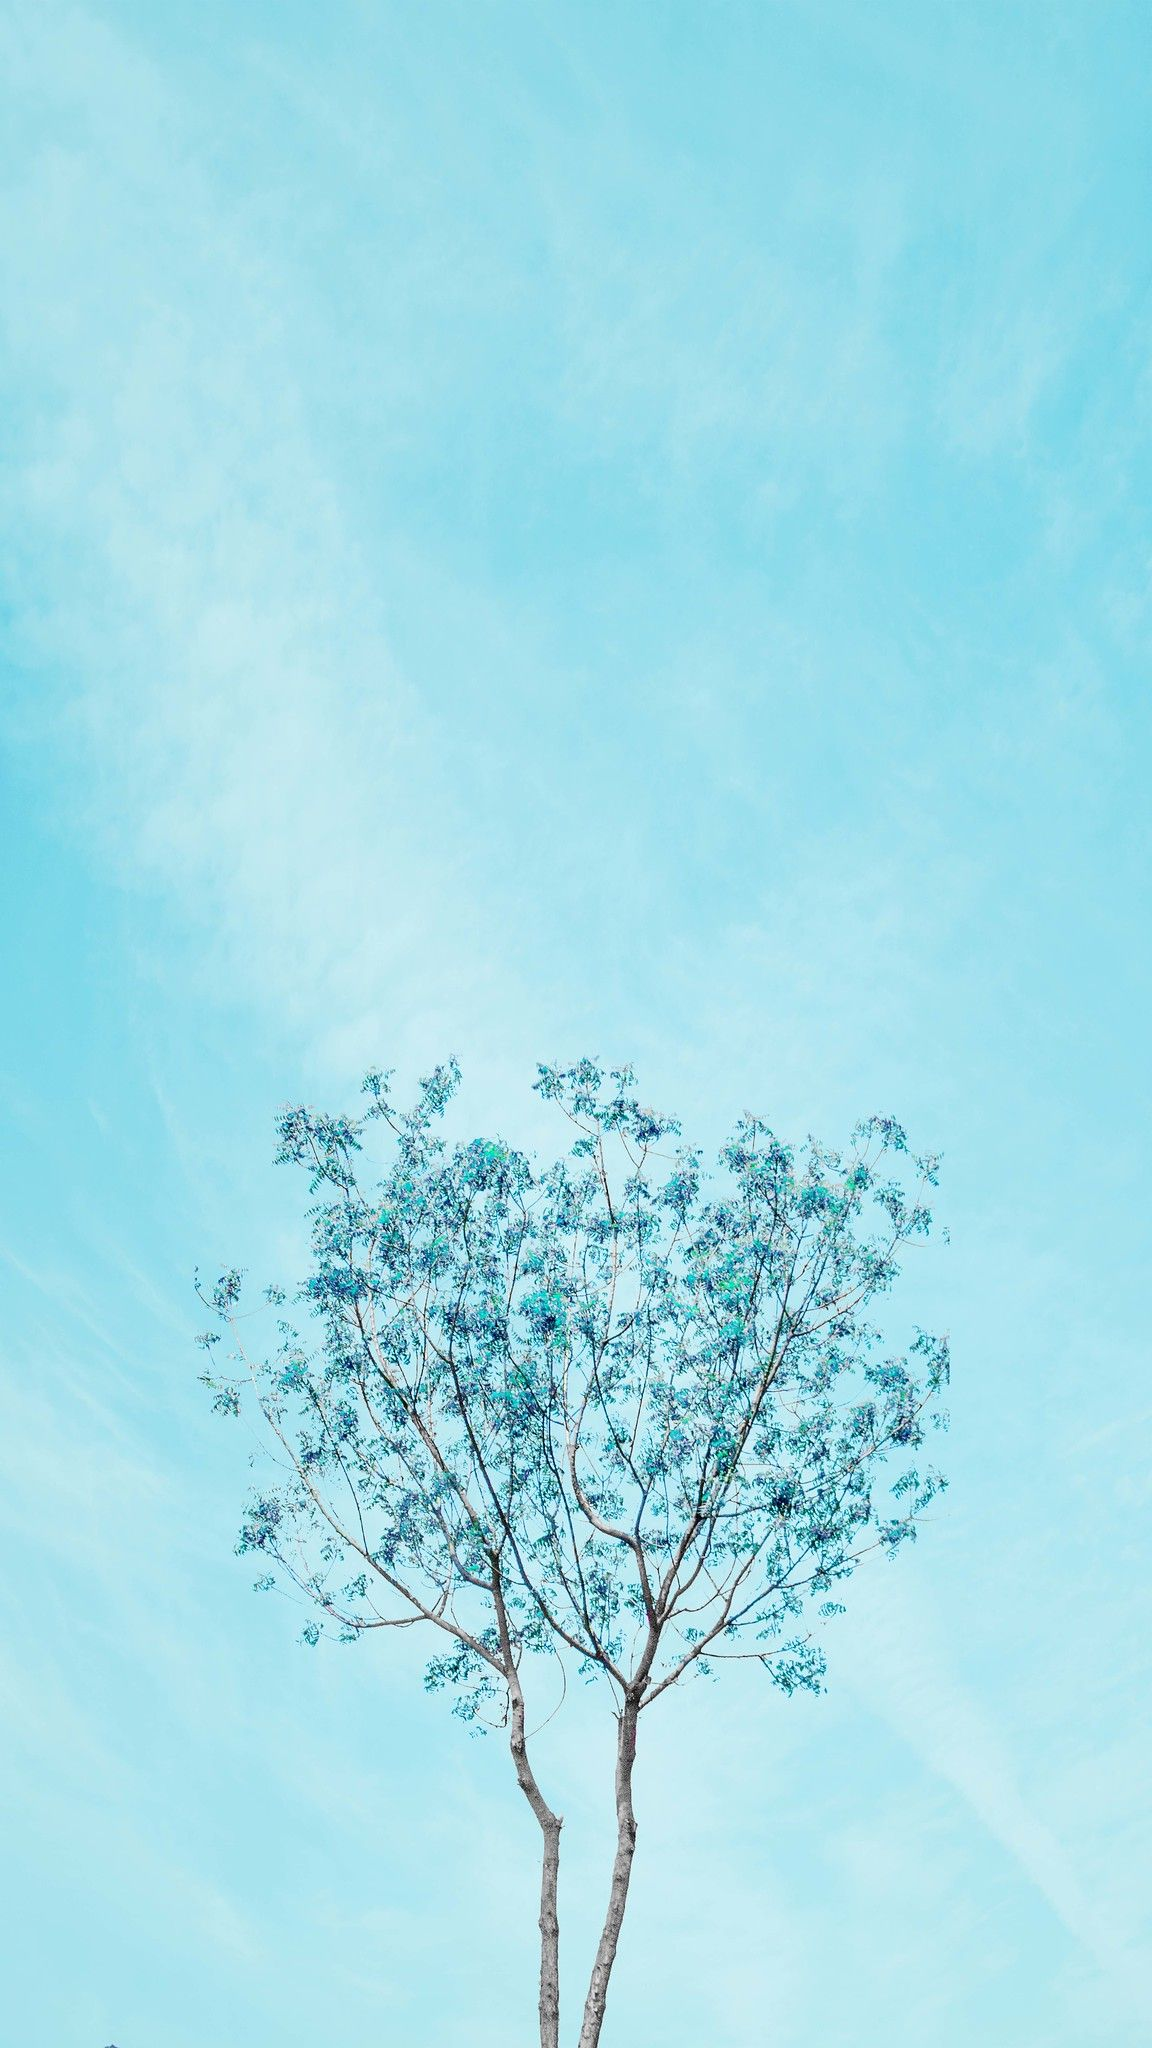 Pin by Iyan Sofyan on Light Of Life Neon wallpaper